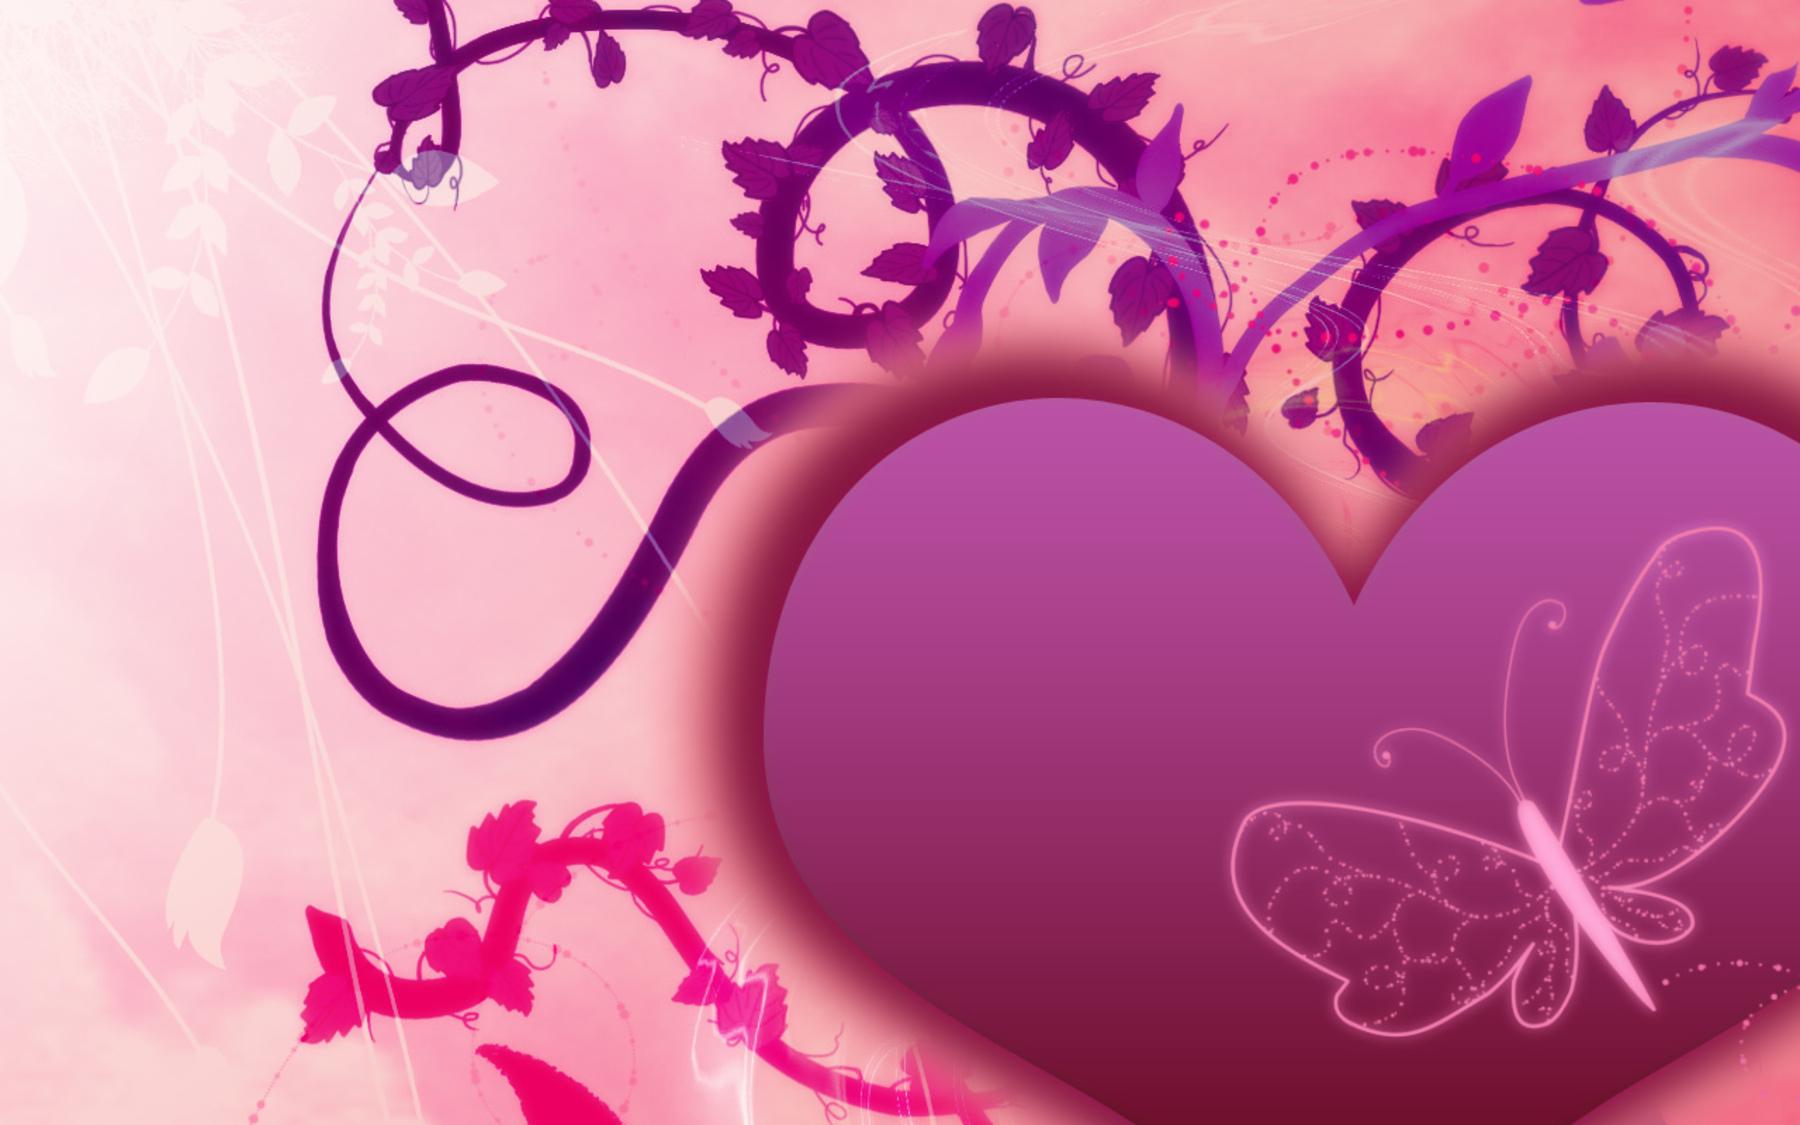 Cute Bff Wallpapers Love Wallpapers Hd Amor Fondos De Pantalla Love 3d